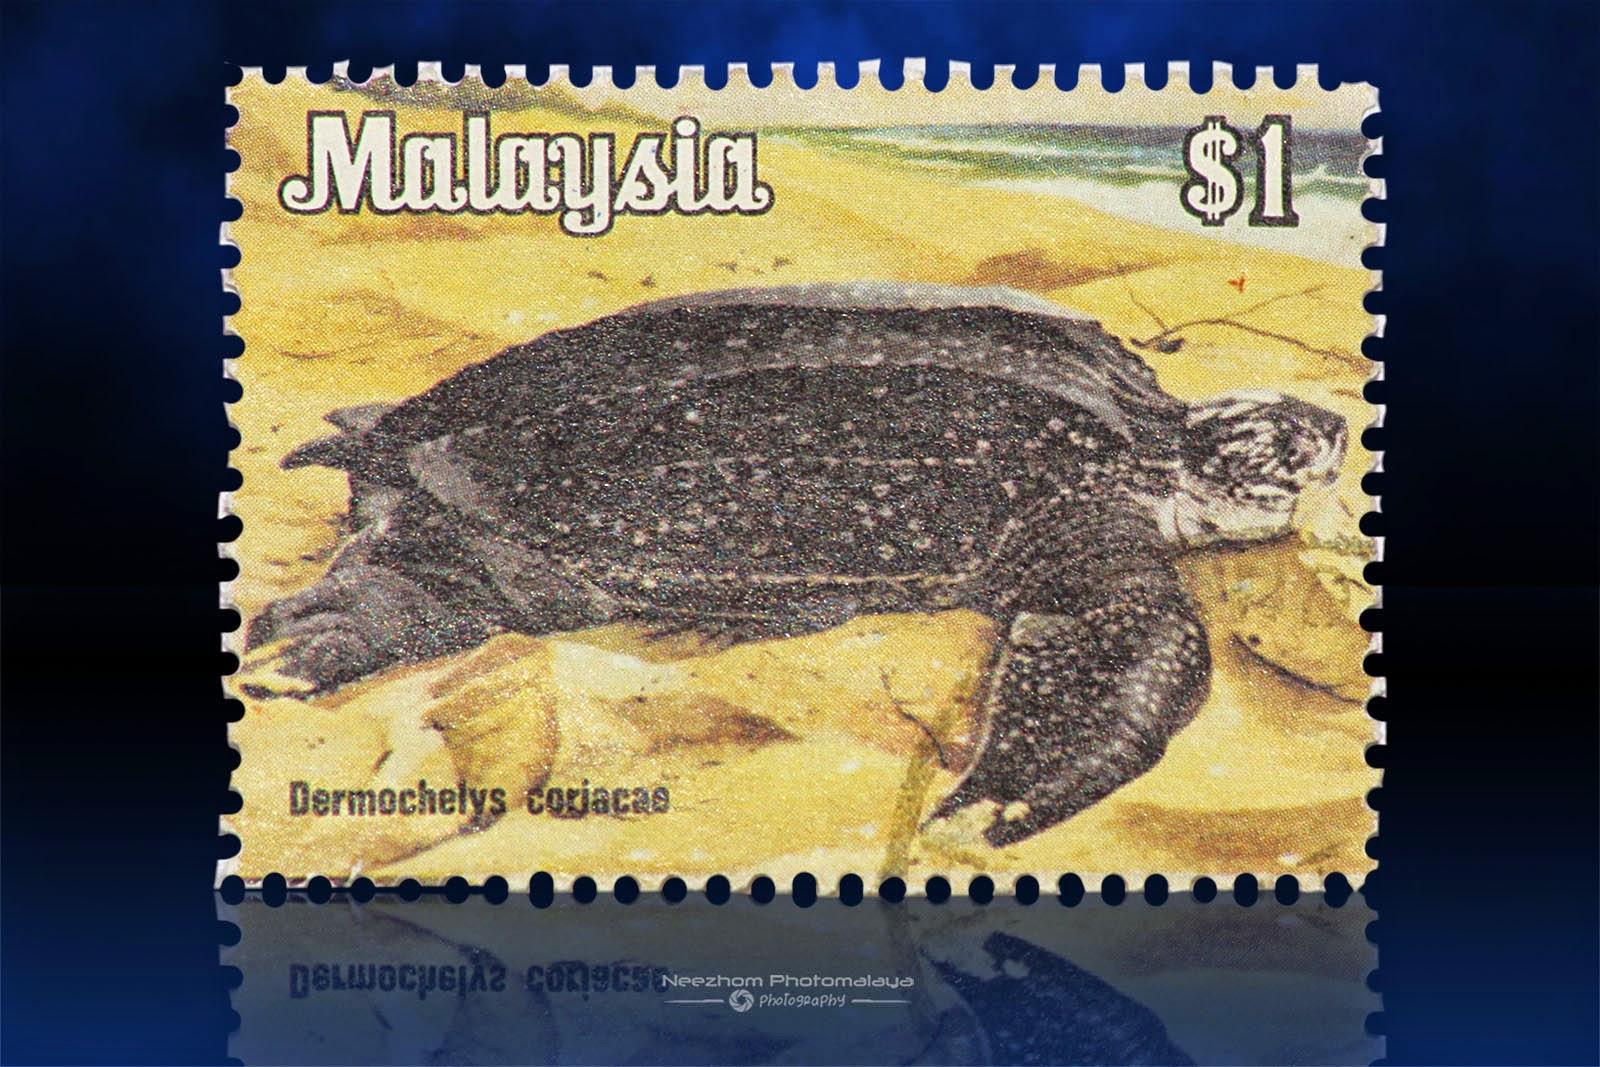 National Animals Series 1979 stamps - $1 Dermochelys Coriacae